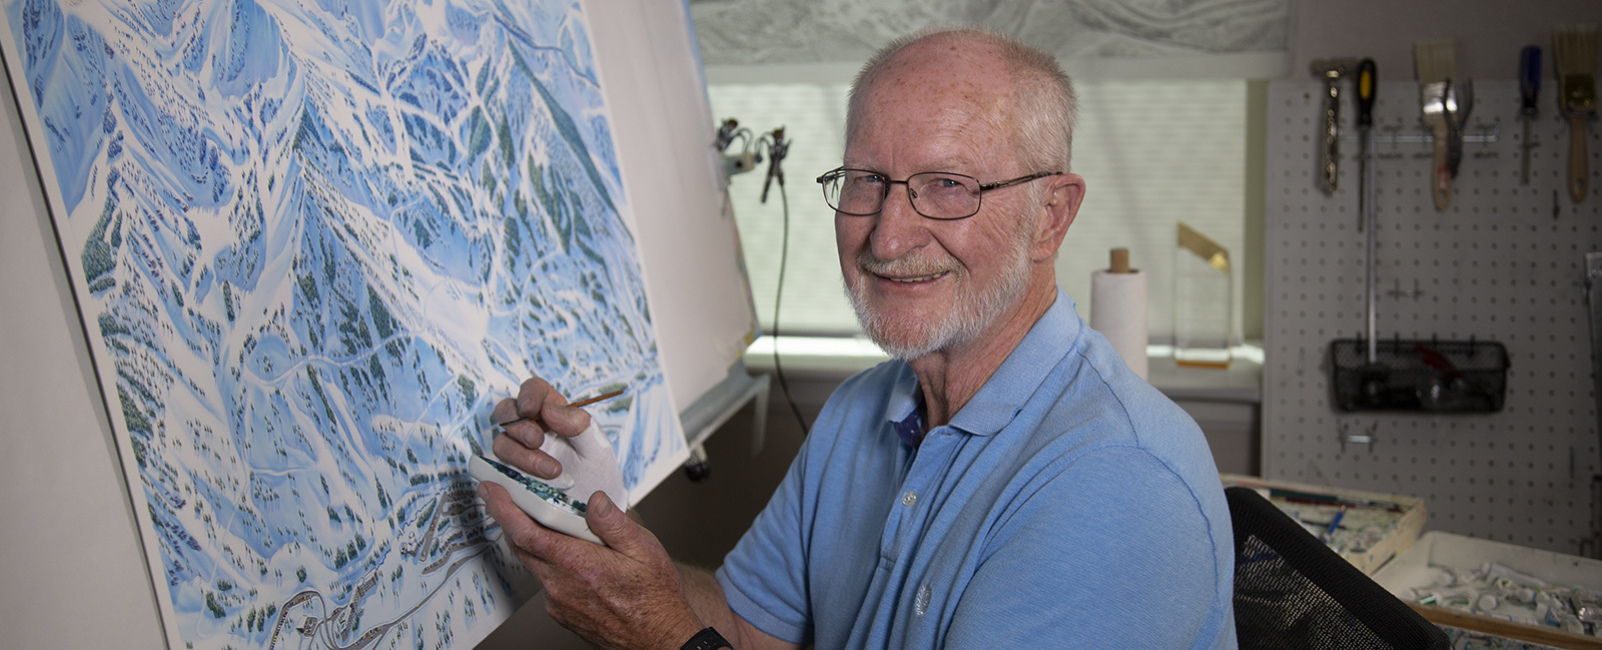 Jim Niehues - The Man Behind The Maps